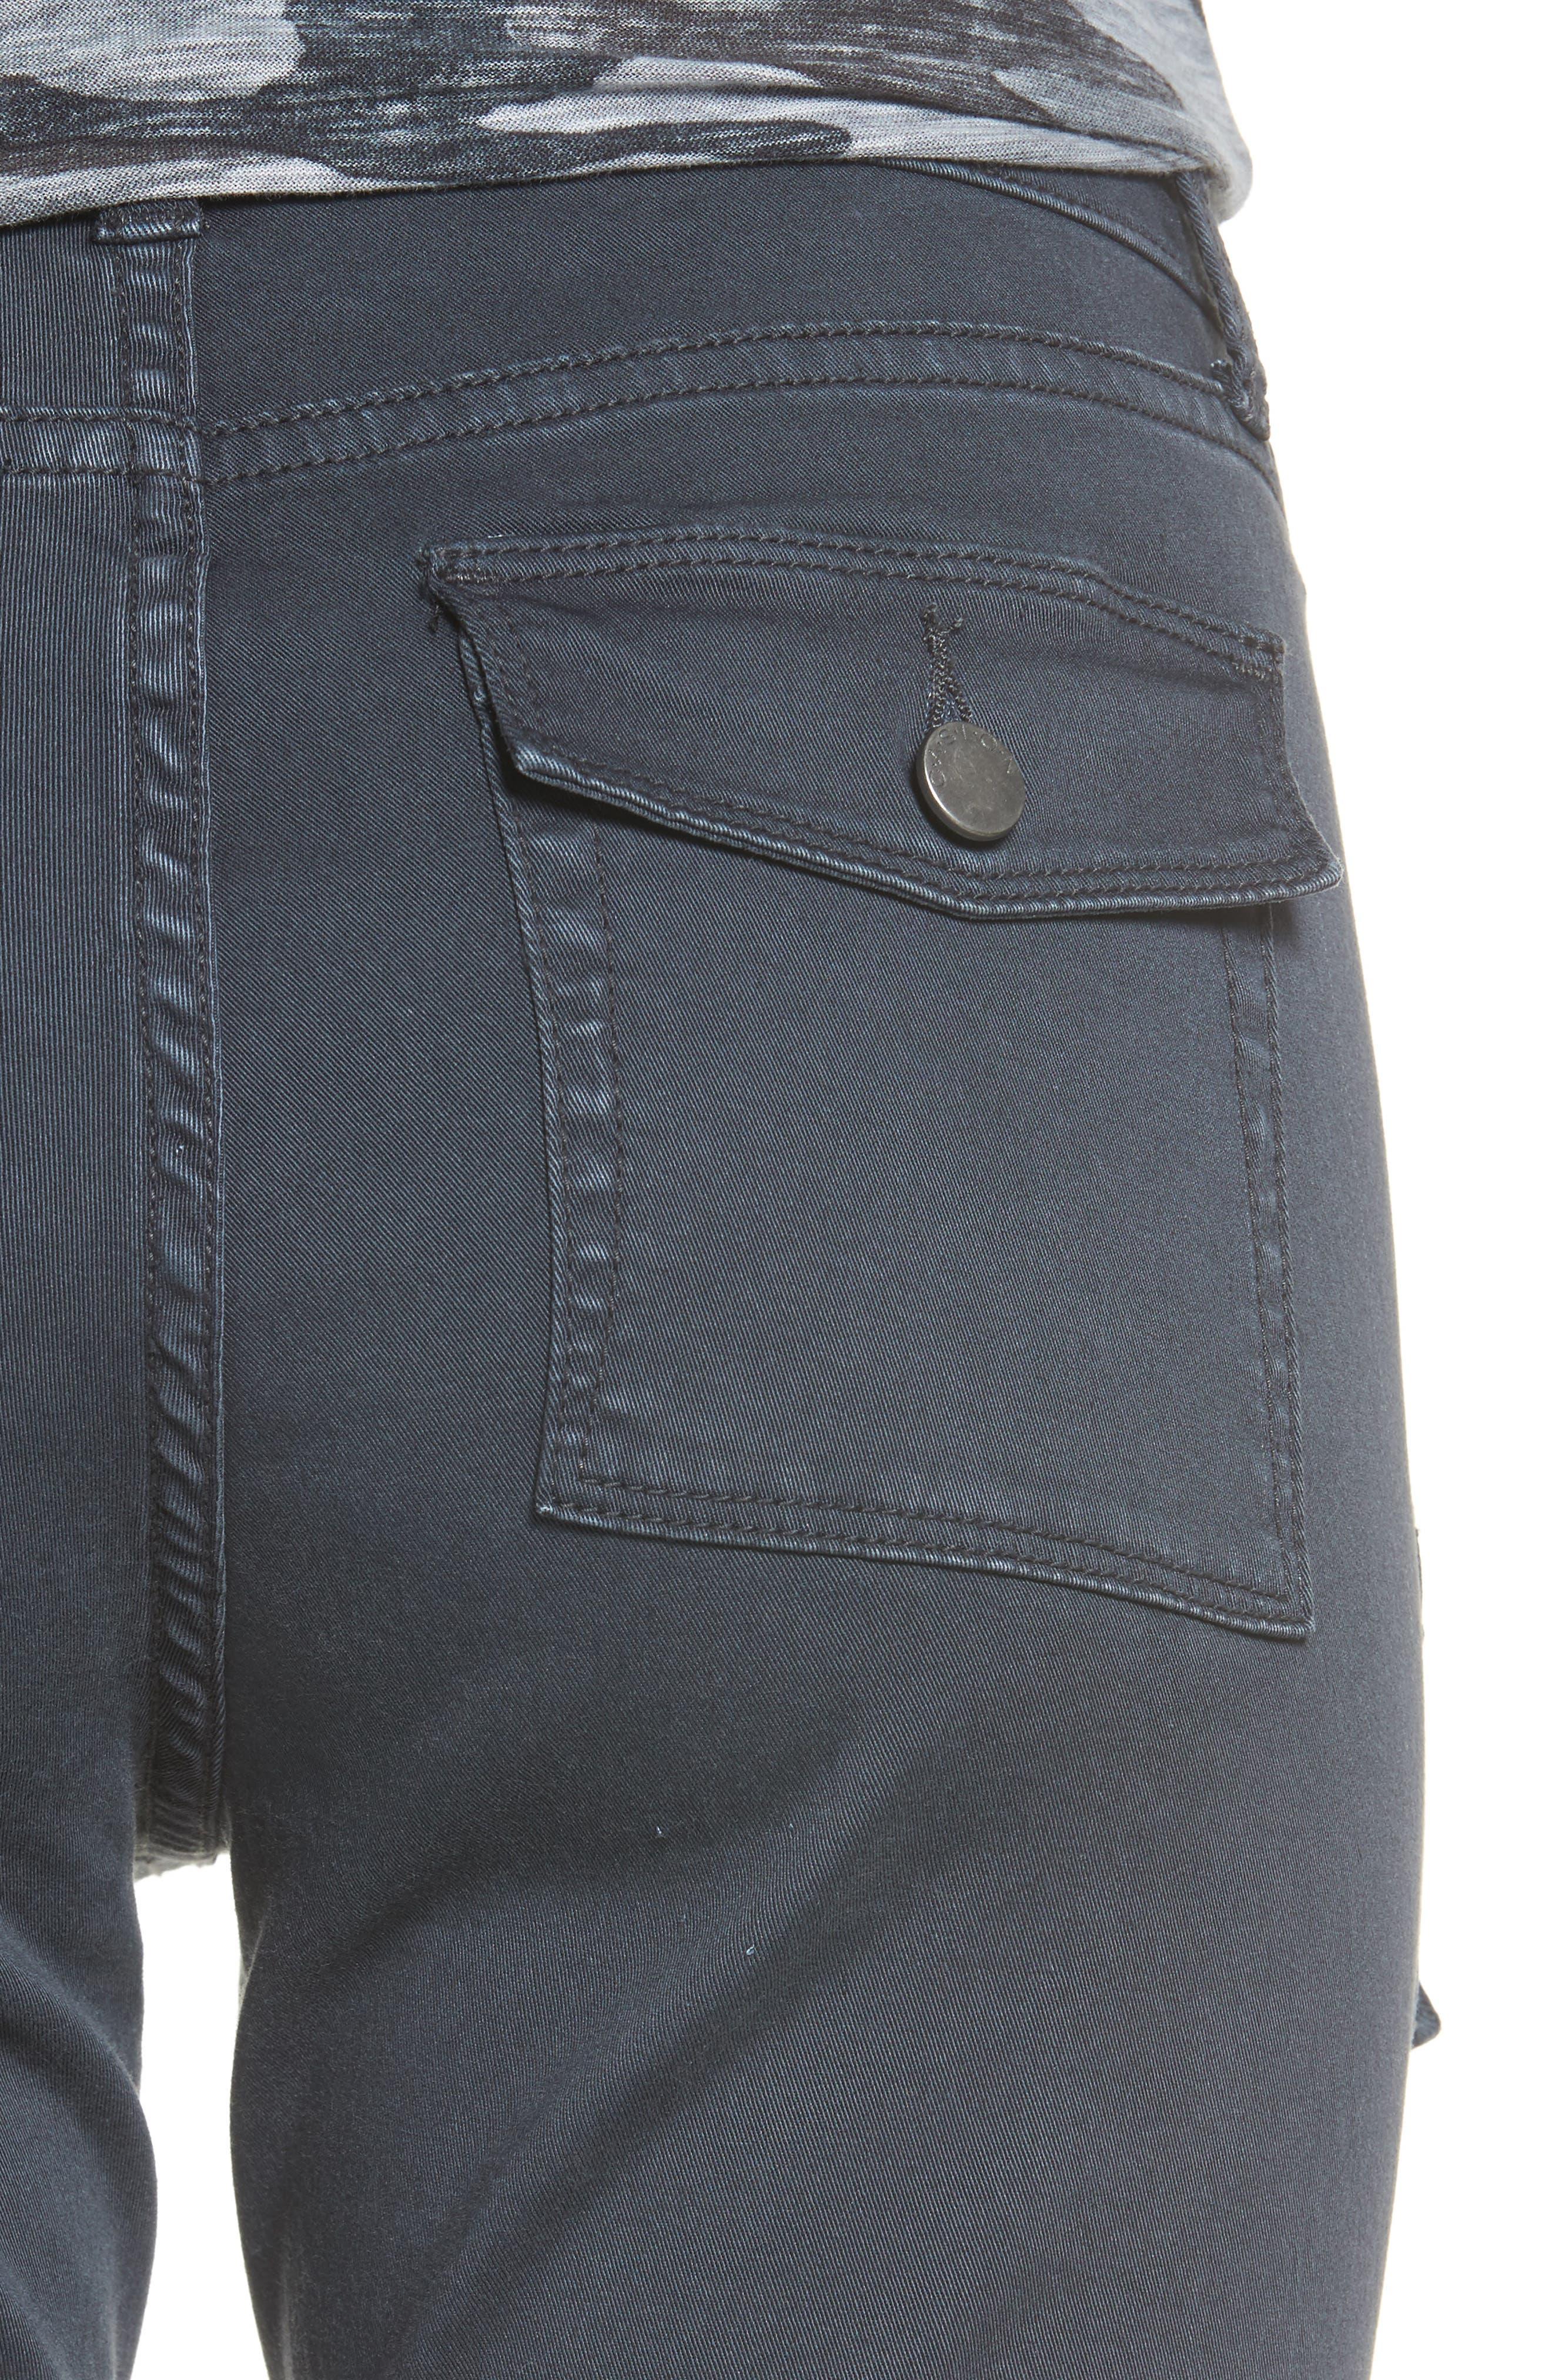 Slim Utility Pants,                             Alternate thumbnail 7, color,